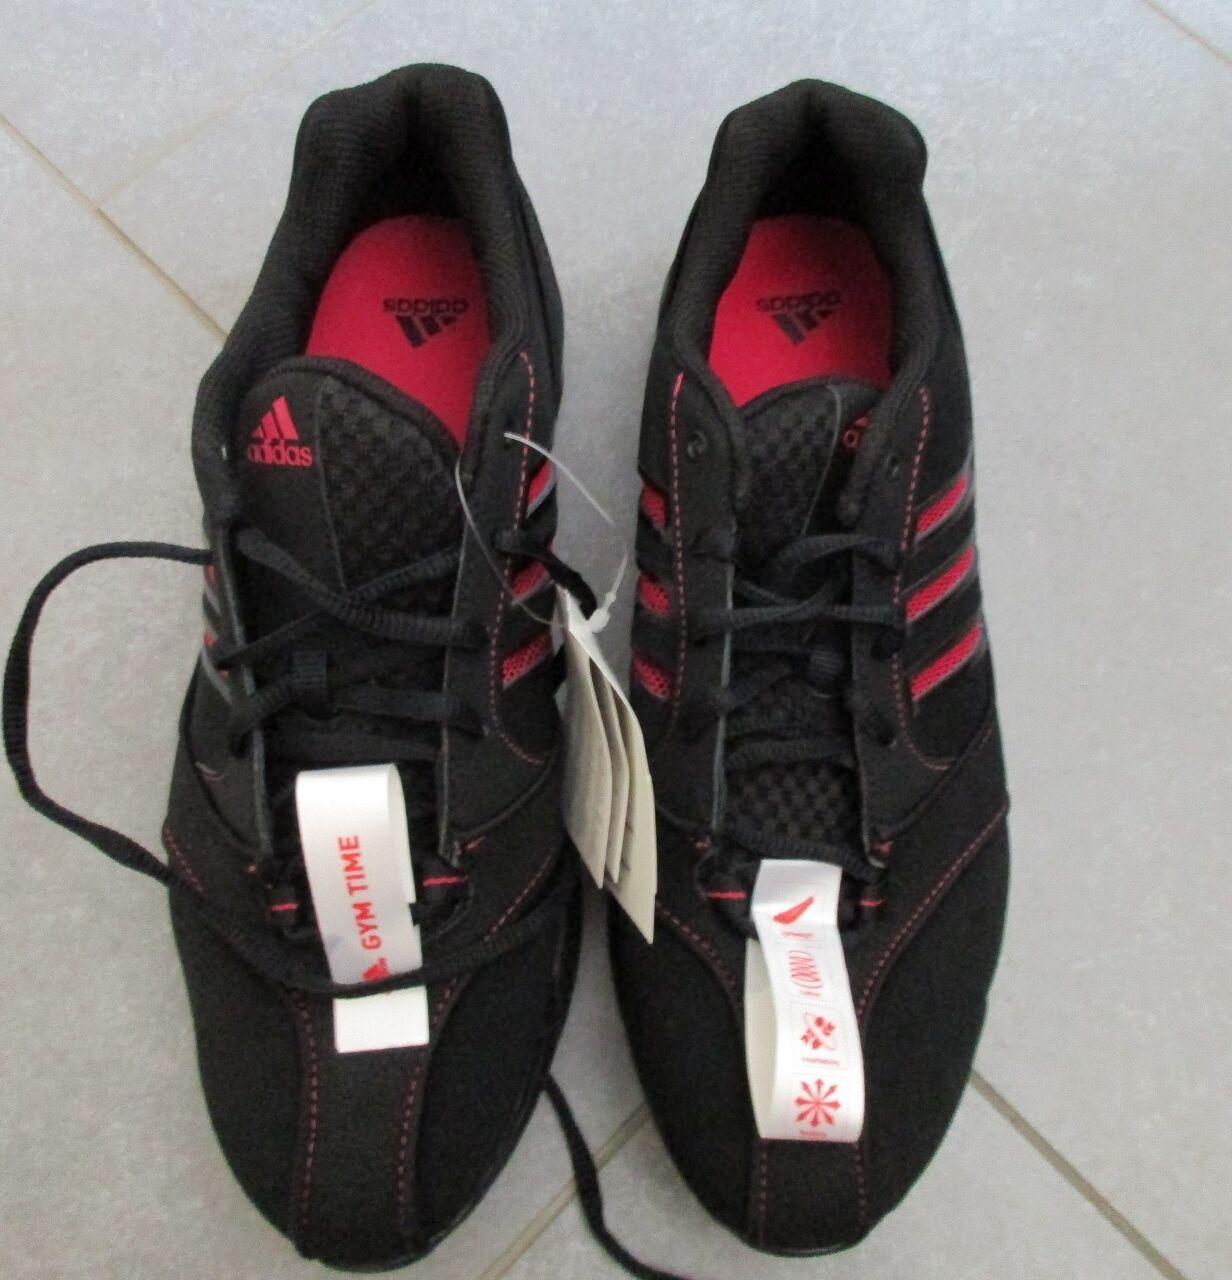 Adidas Schuhe Laufschuhe Sportschuhe Indoor Rizer Rizer Indoor II Lo schwarz pink Gr. 41 1/3 bb94ba